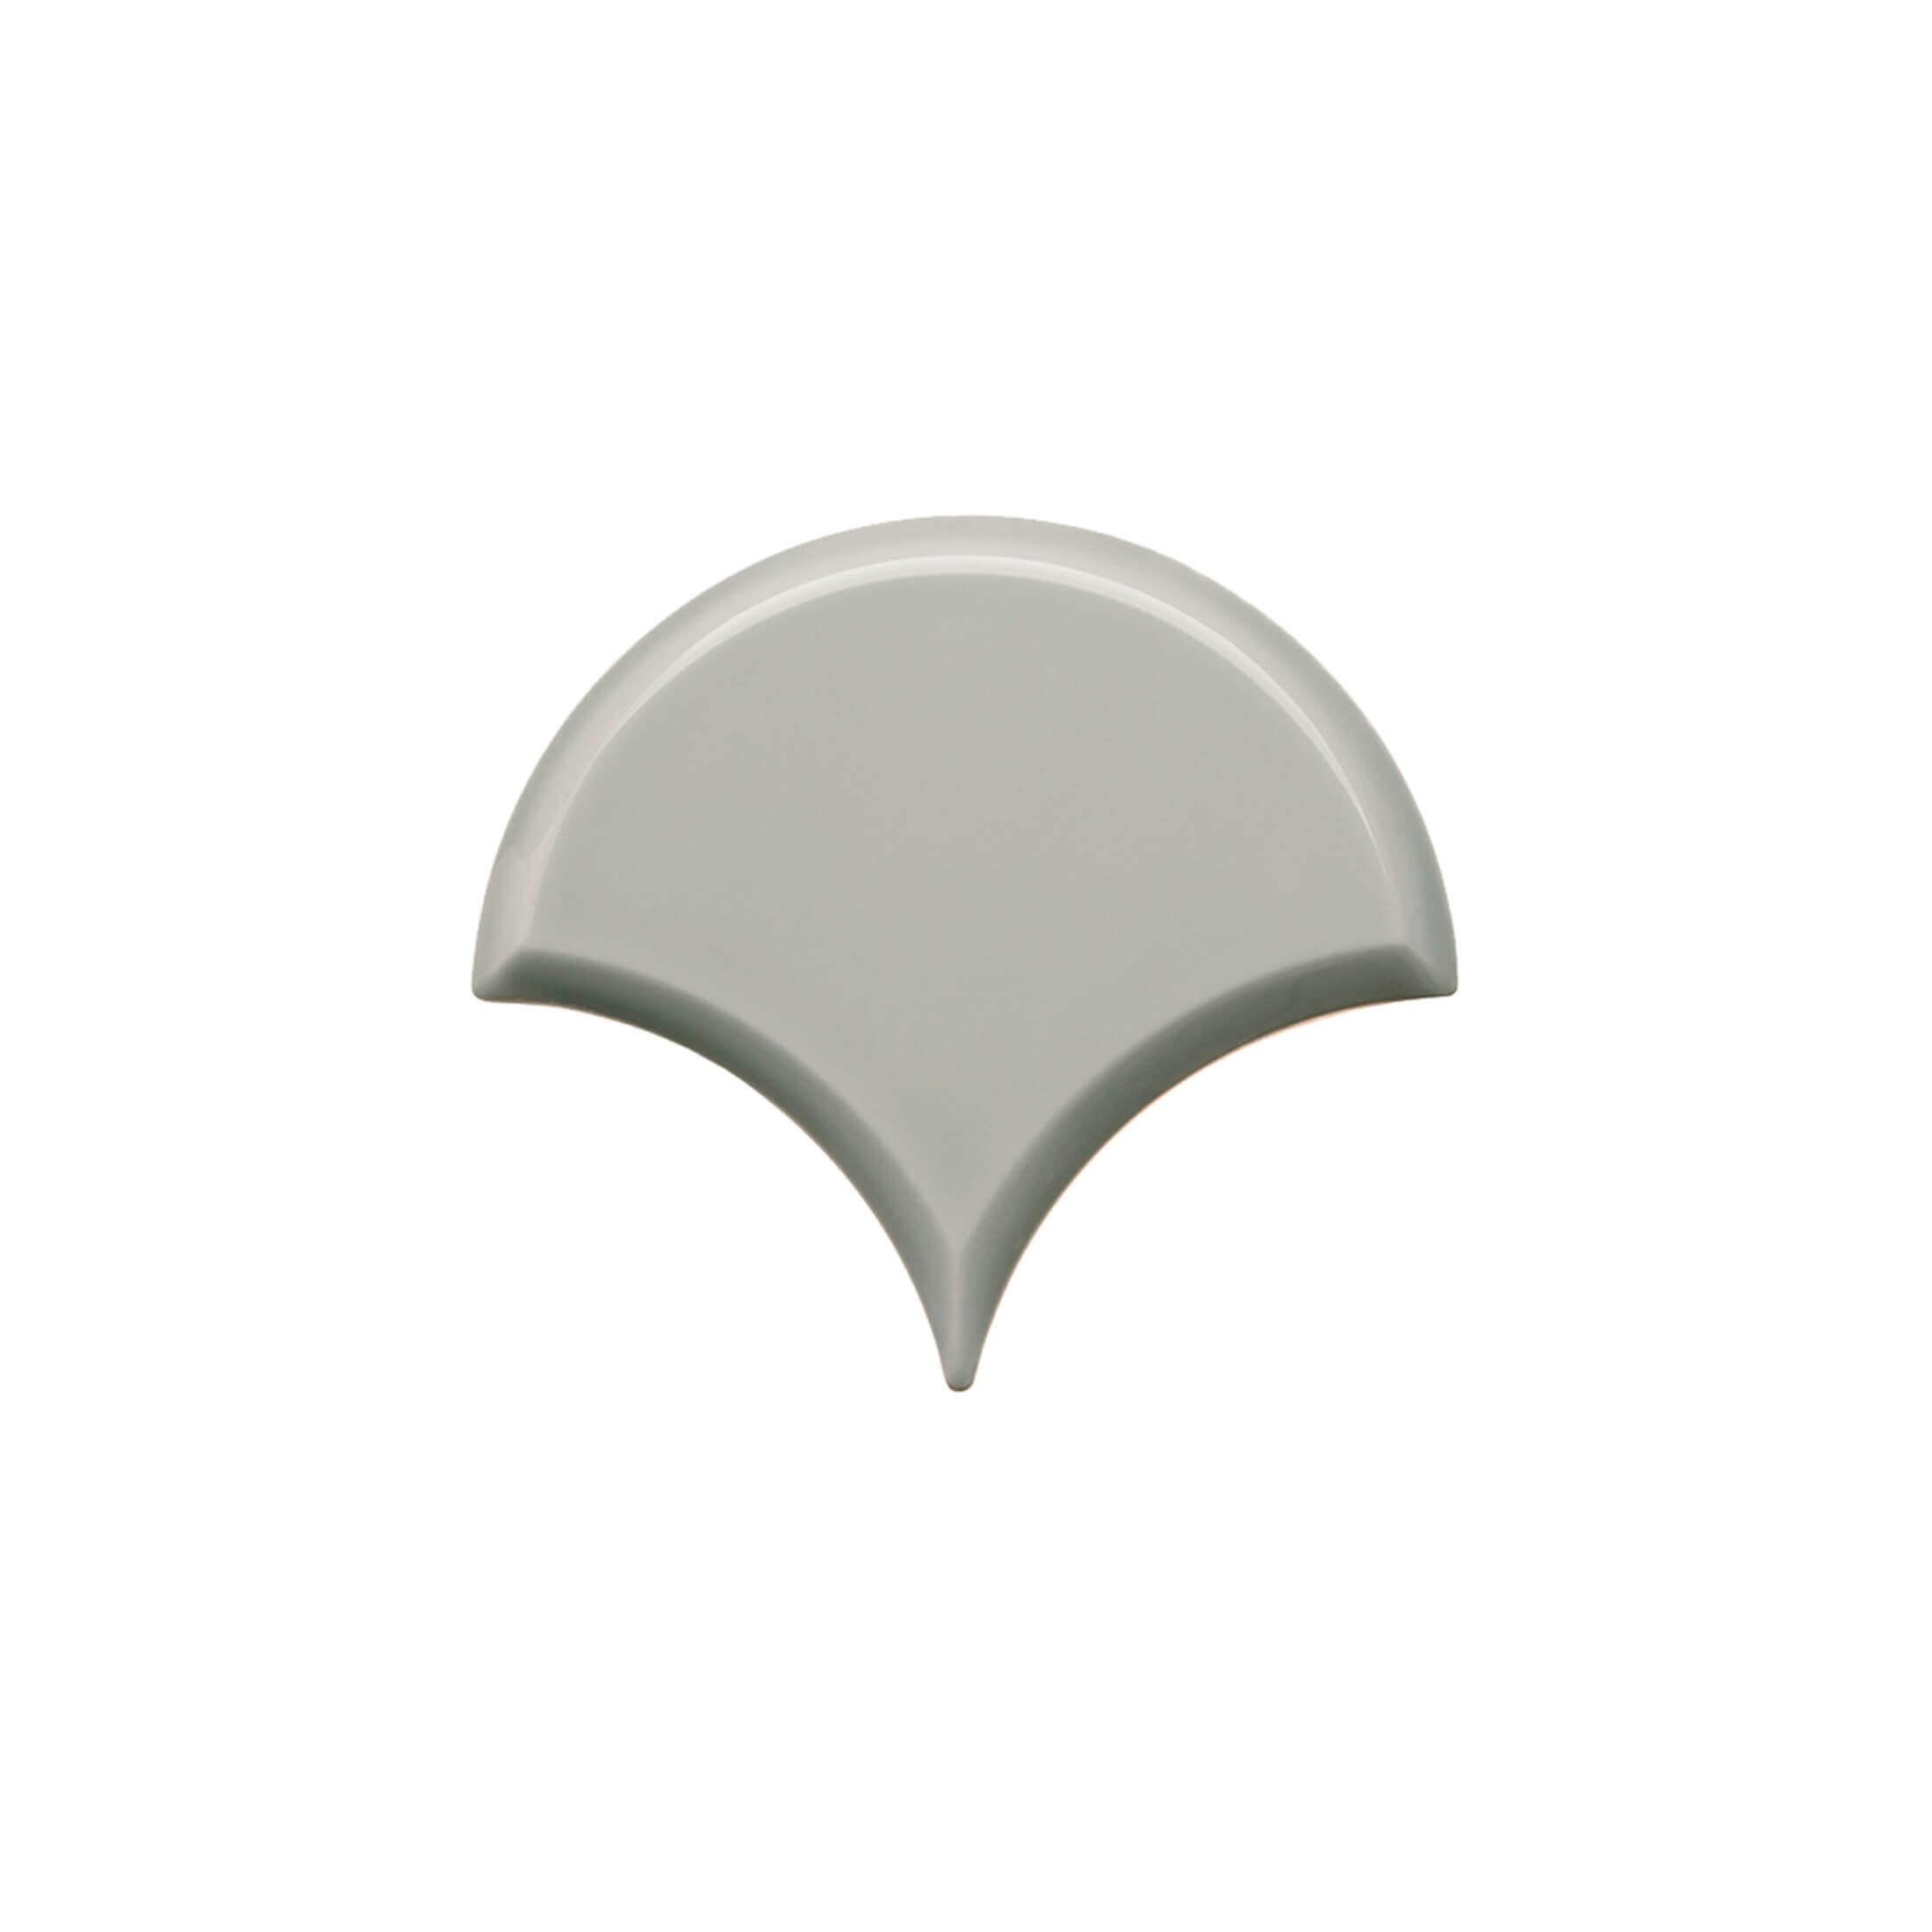 ADST8021 - 13 cm X 15 cm